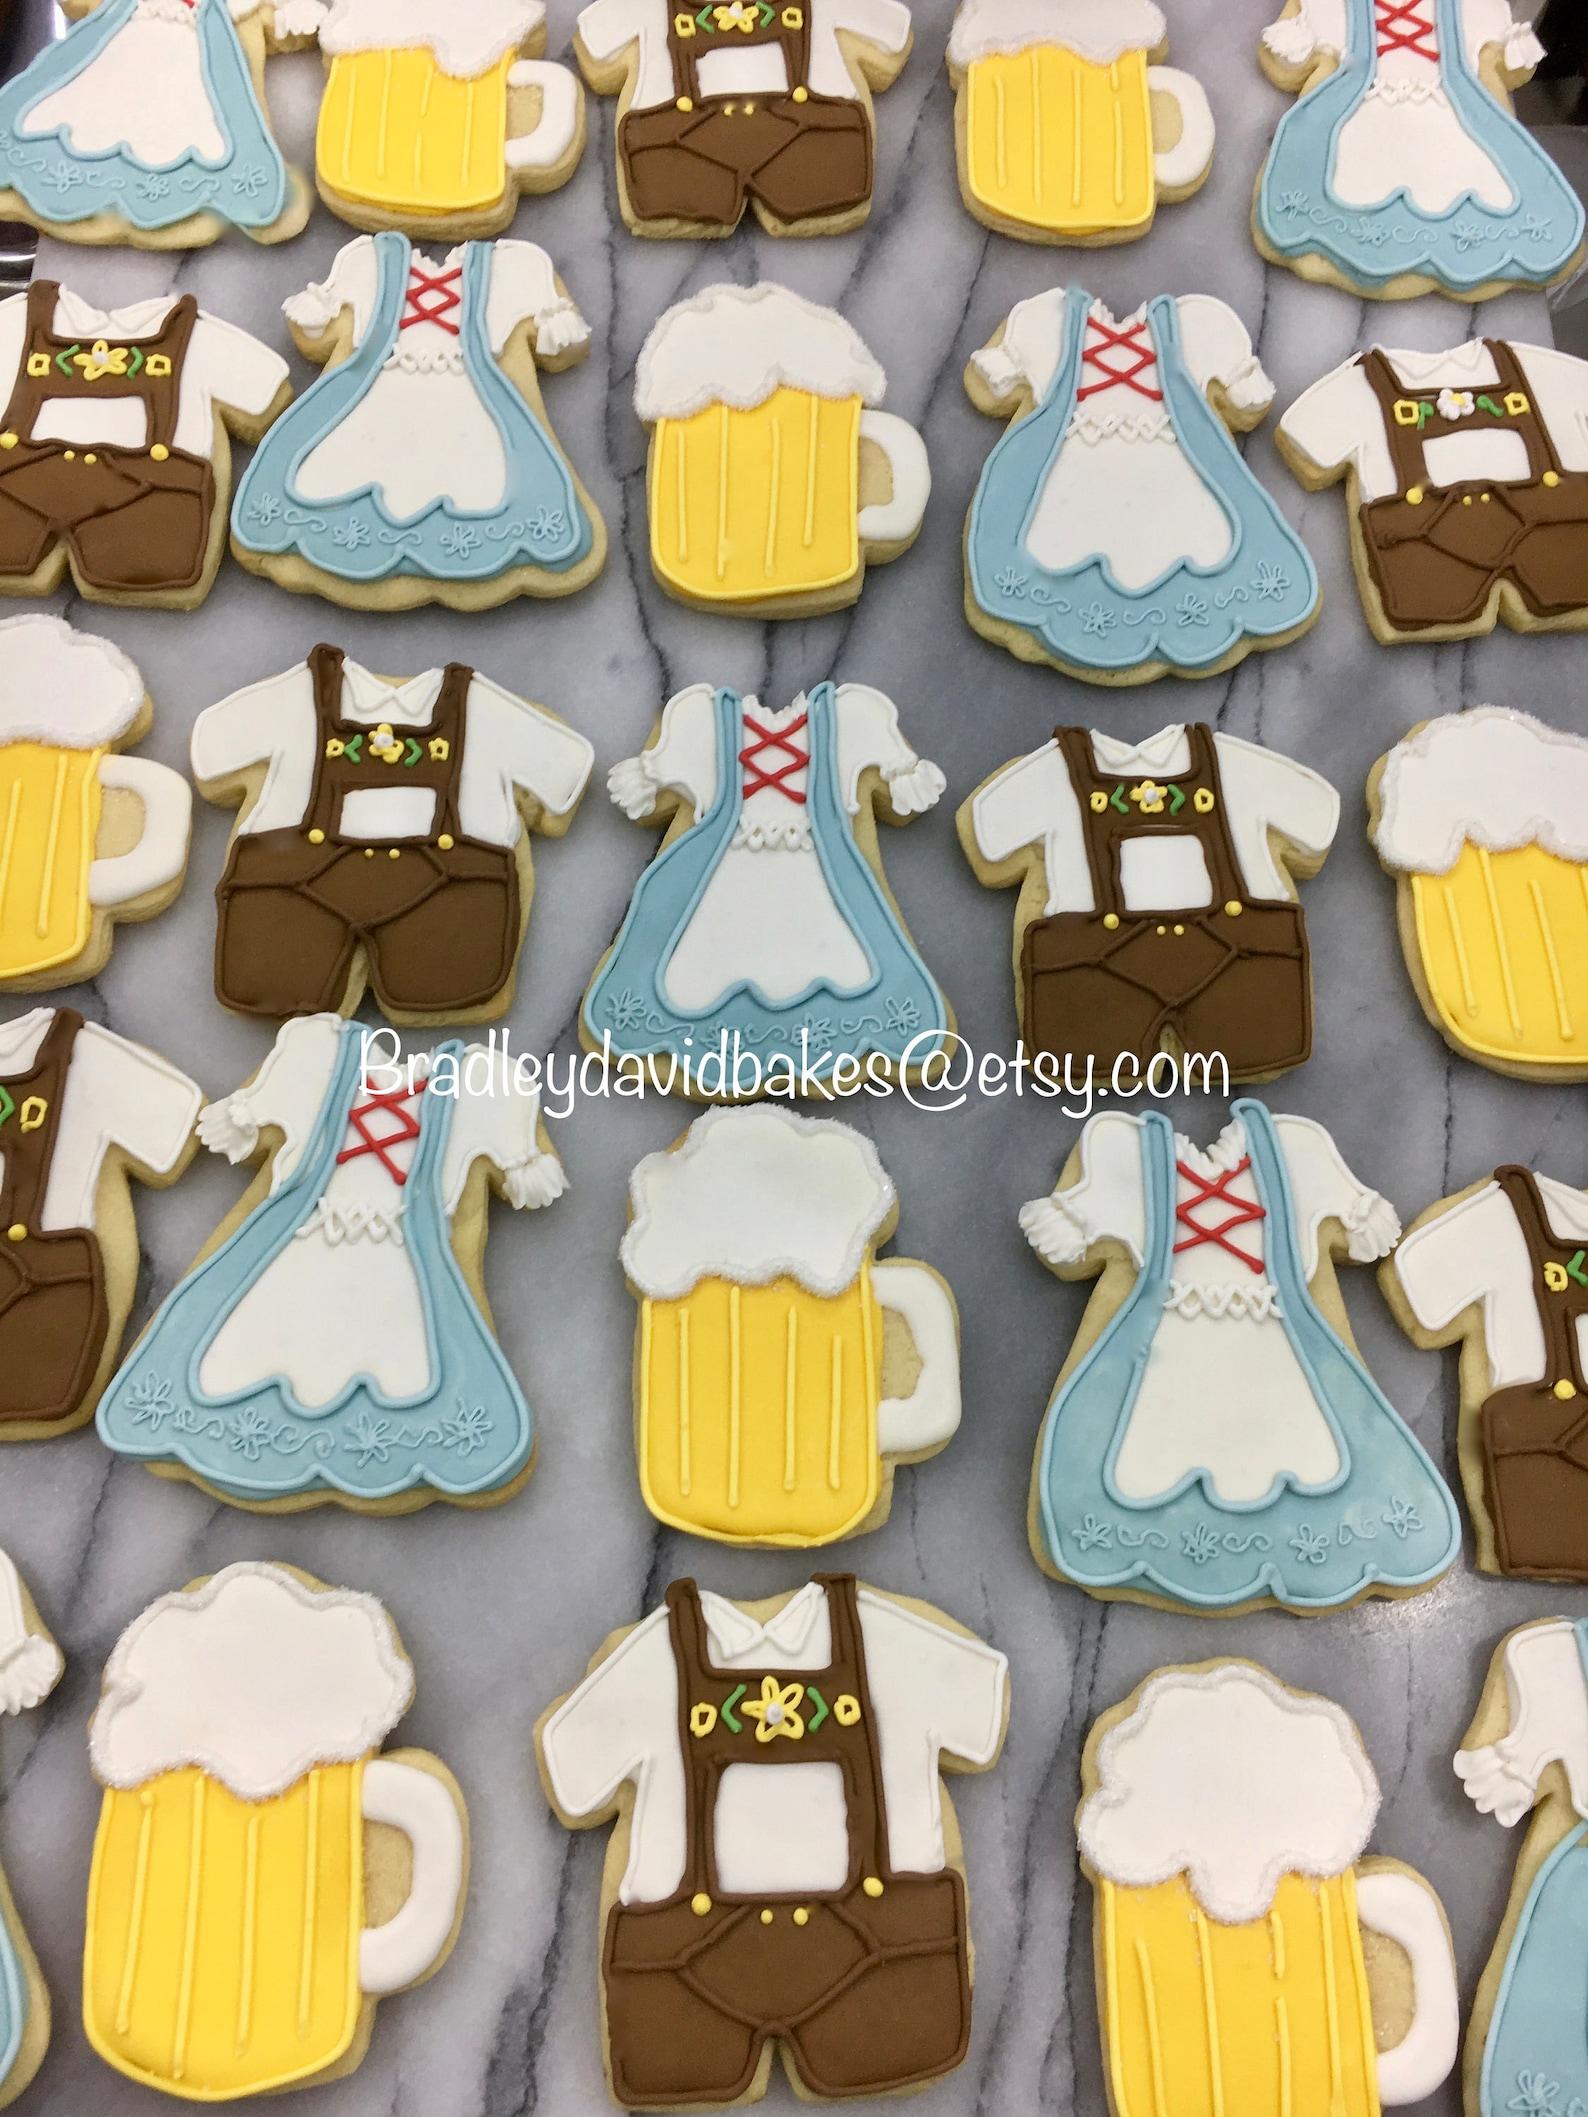 Octoberfest & Beer Decorated Cookies